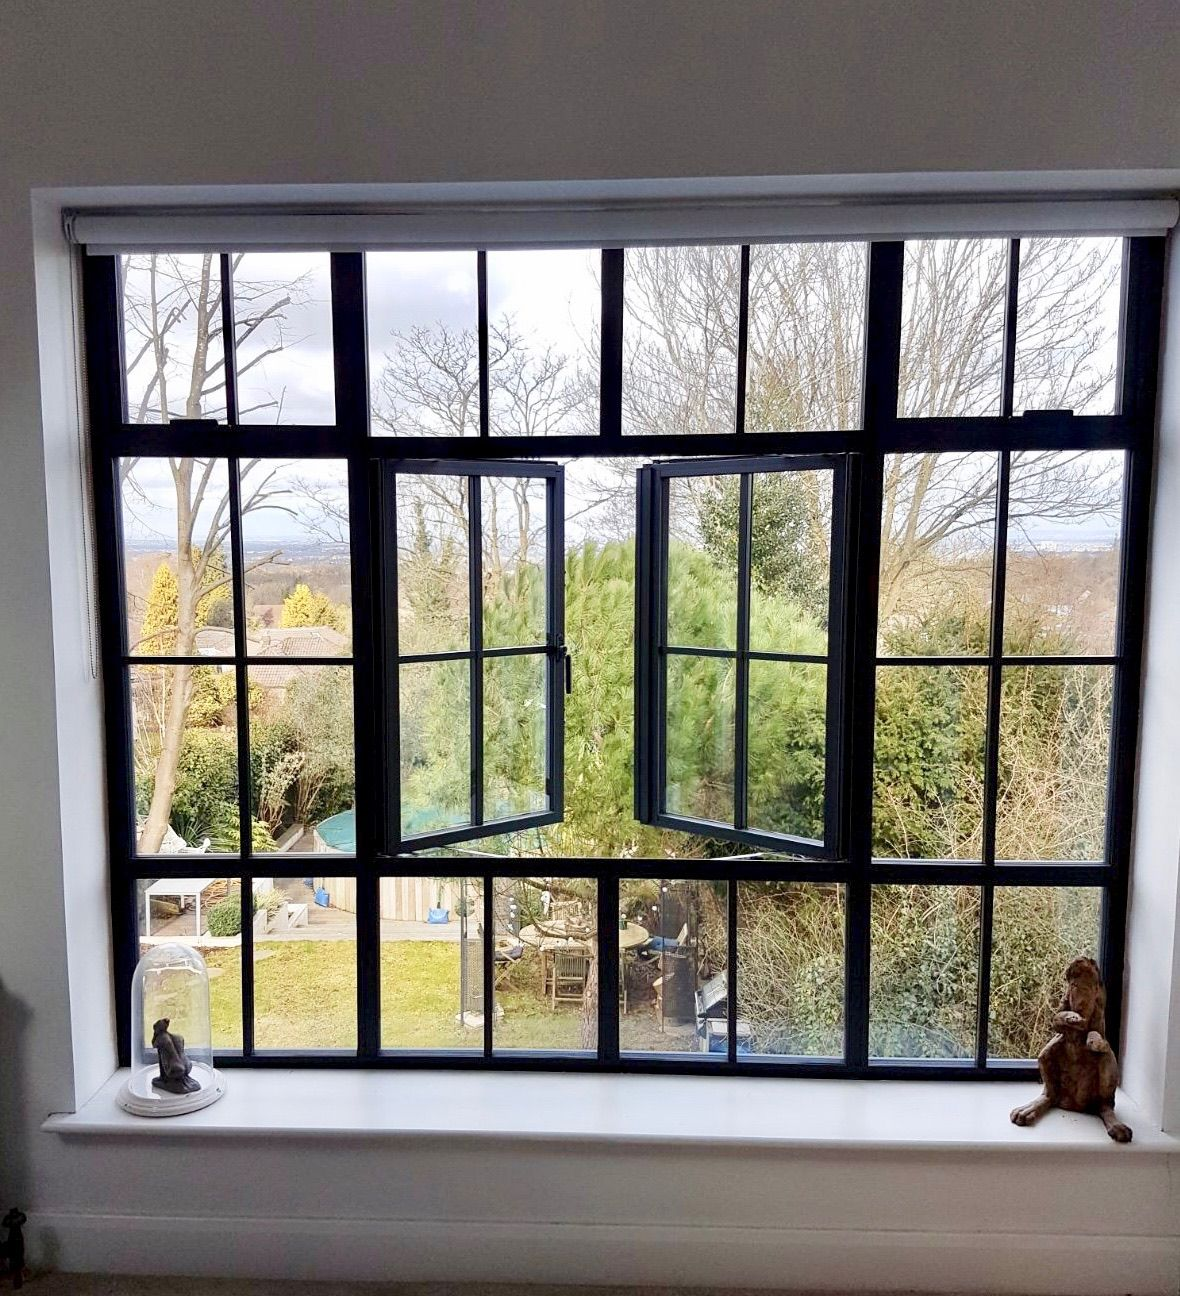 Heritage Aluminium Windows And Doors Aluminium Windows And Doors Aluminium Windows Windows And Doors